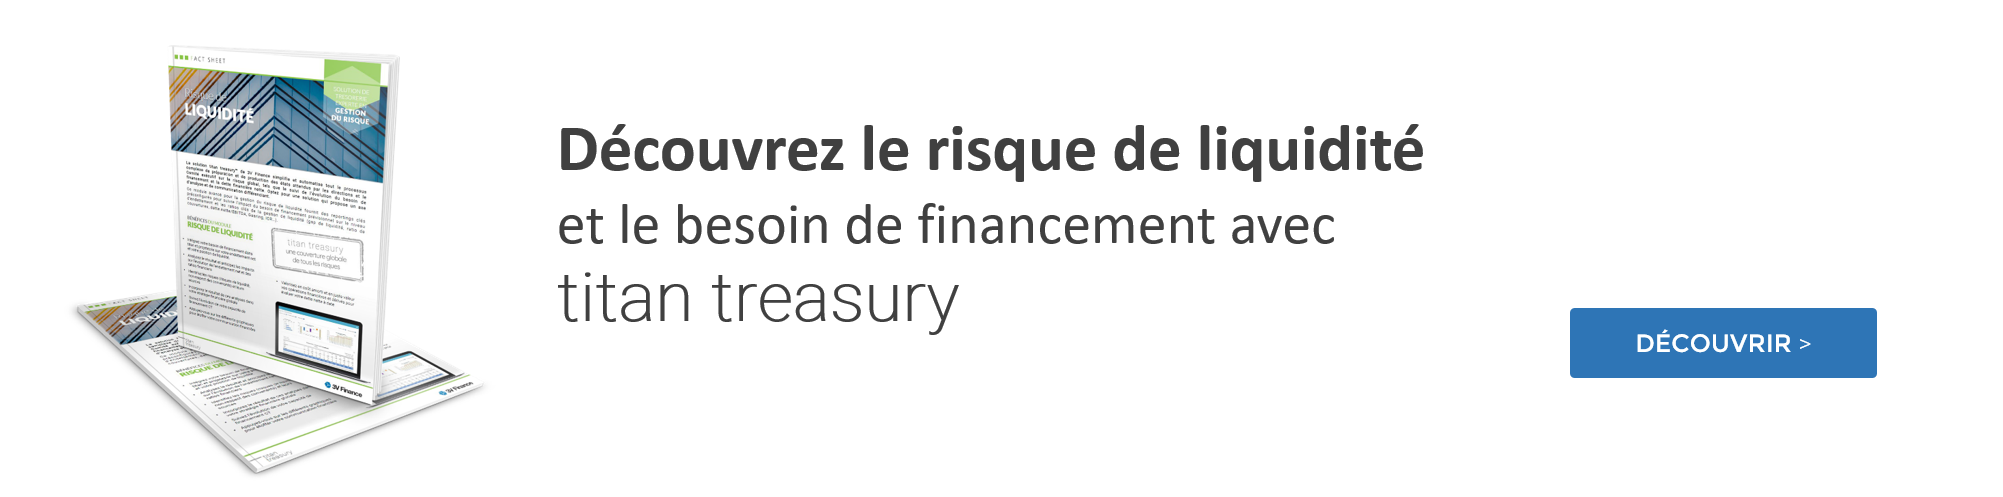 Risque de liquidité